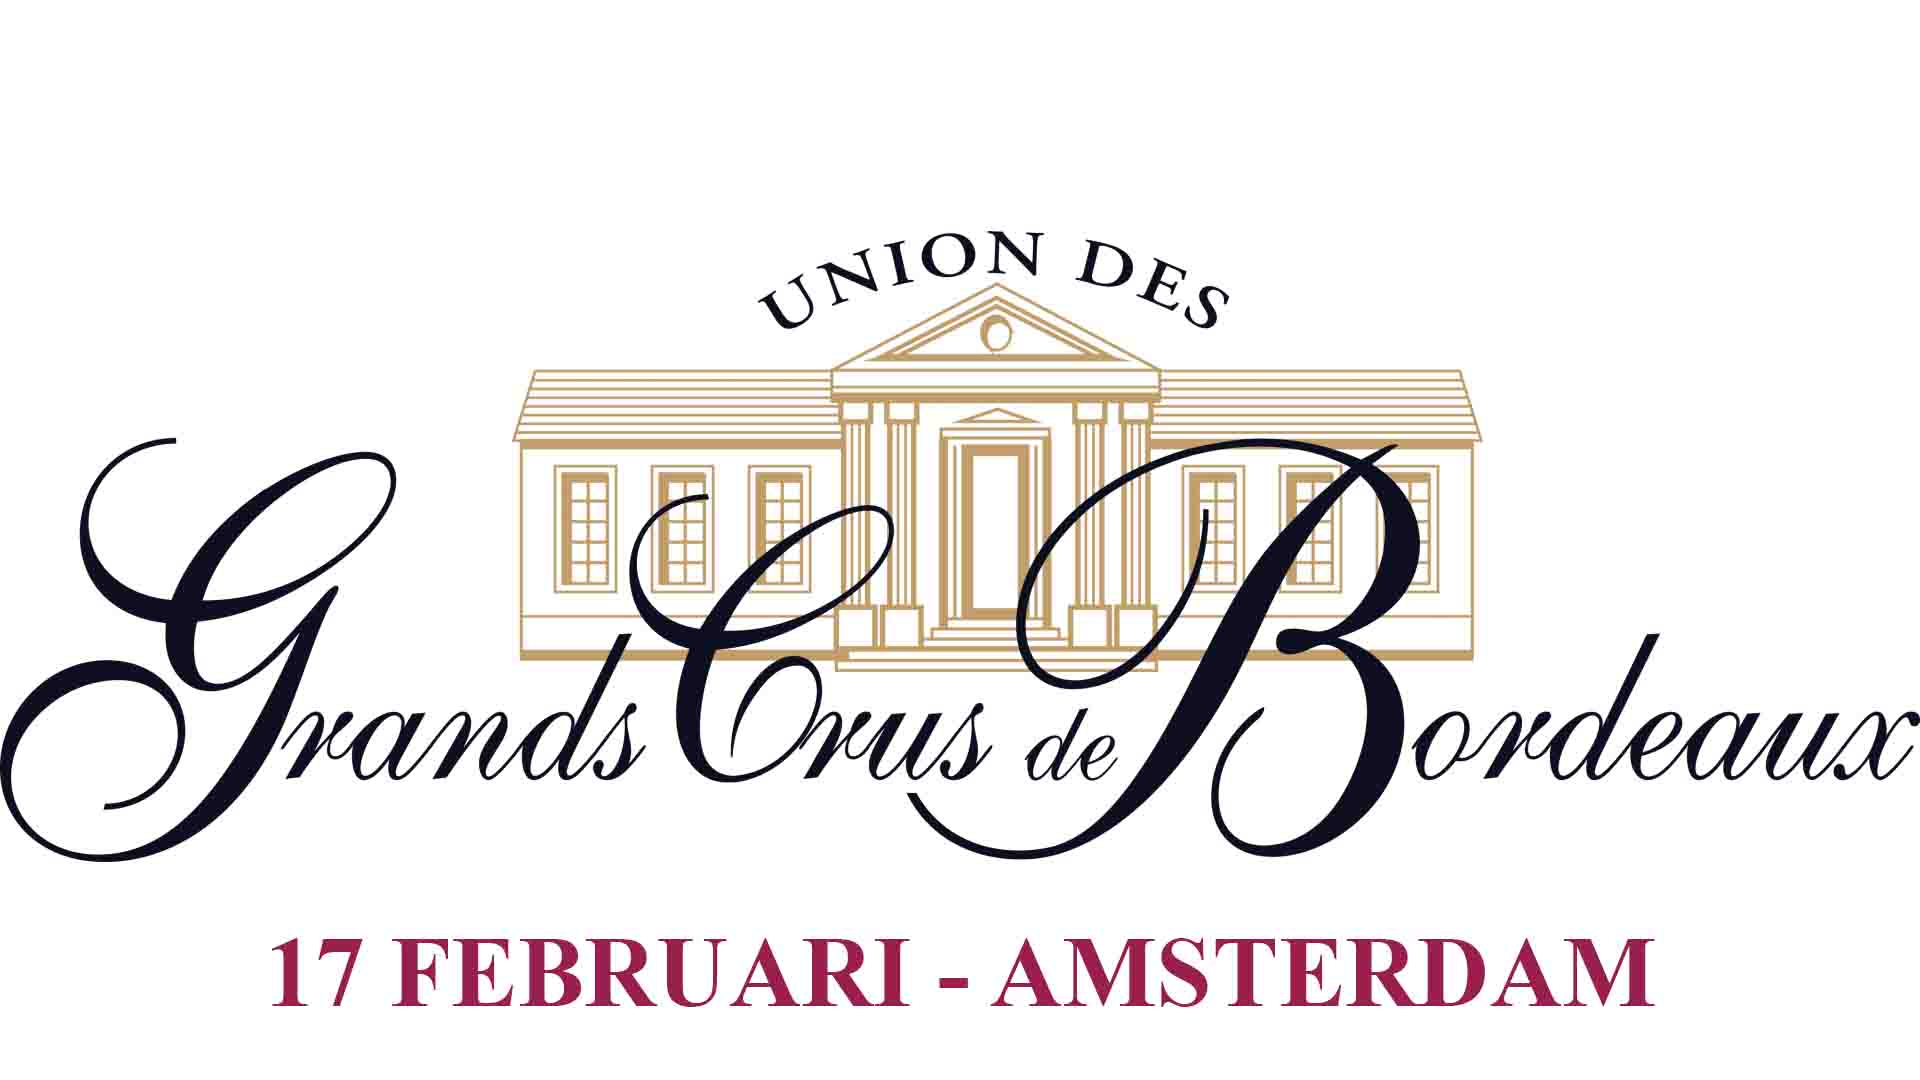 PERSWIJN proeverij Union des Grands Crus de Bordeaux 2020